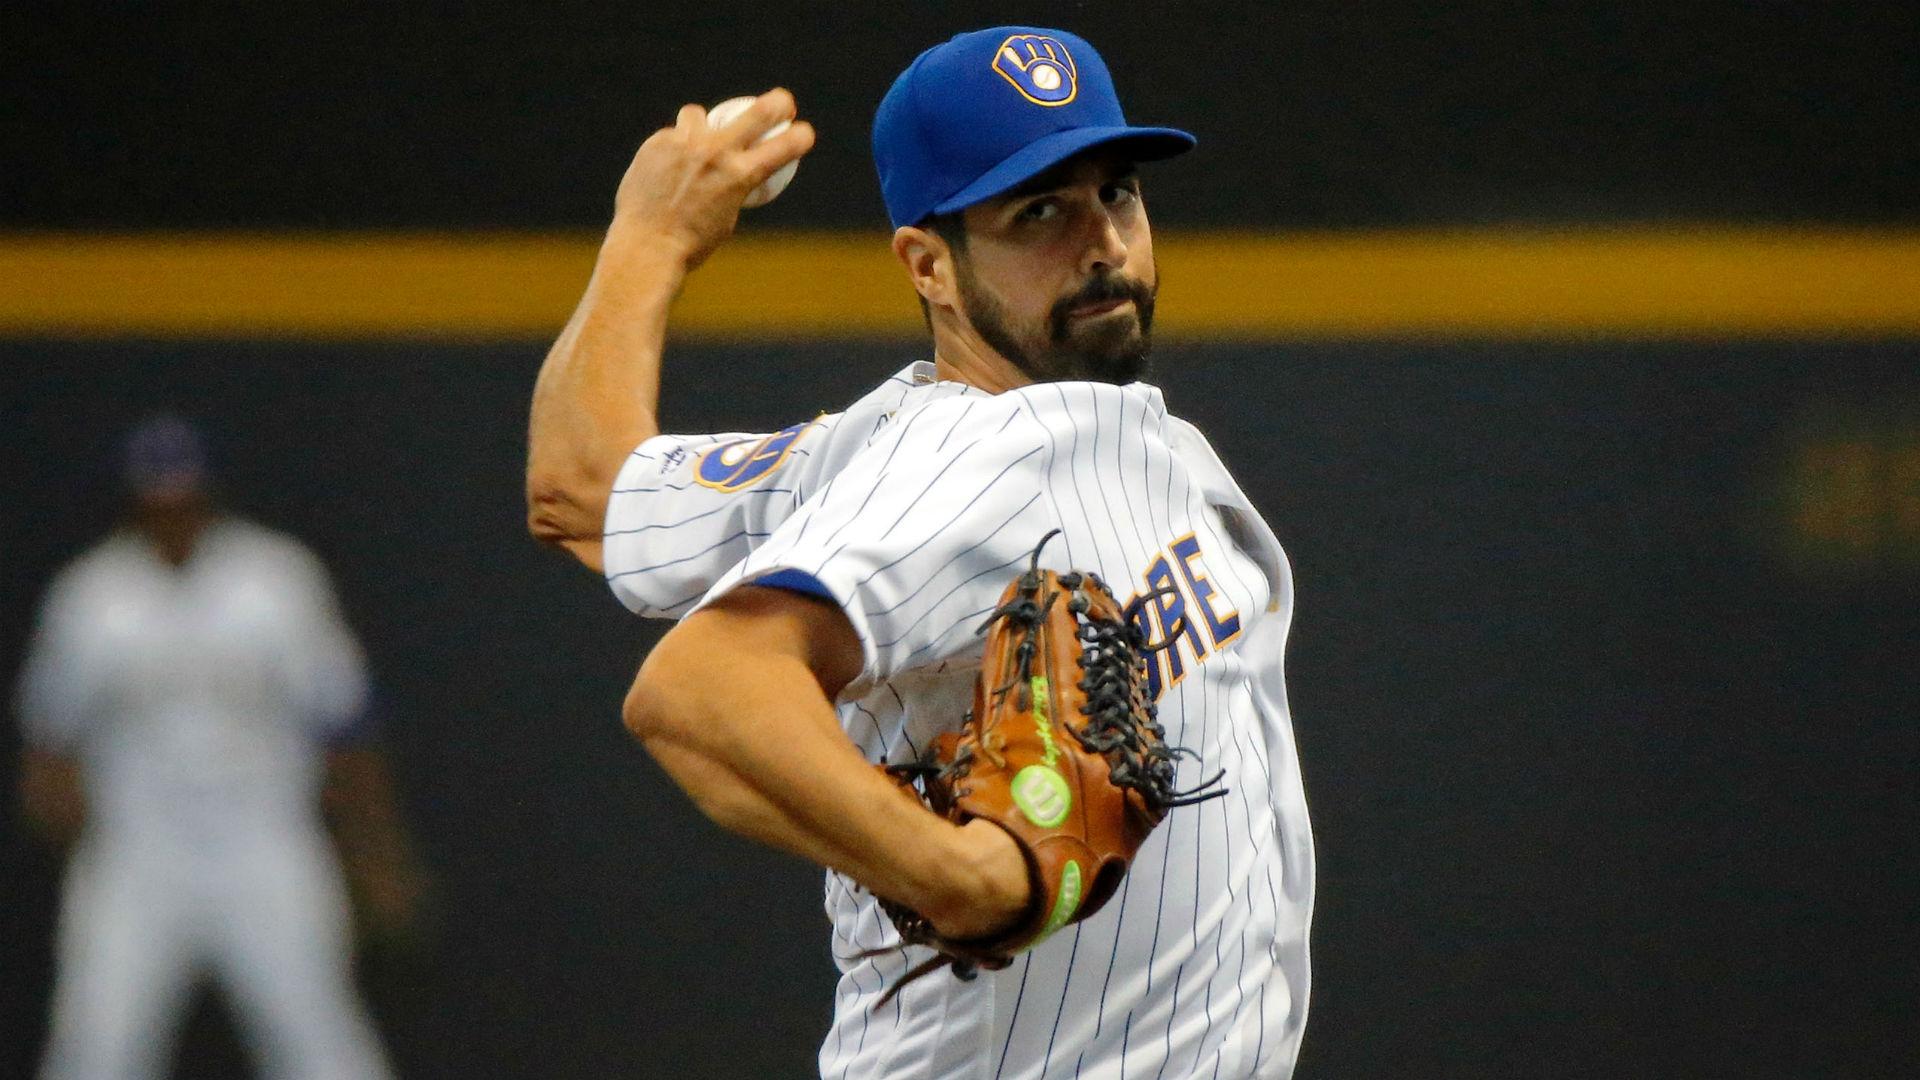 MLB Postseason 2018: Brewers pick Gio Gonzalez to start NLCS Game 1